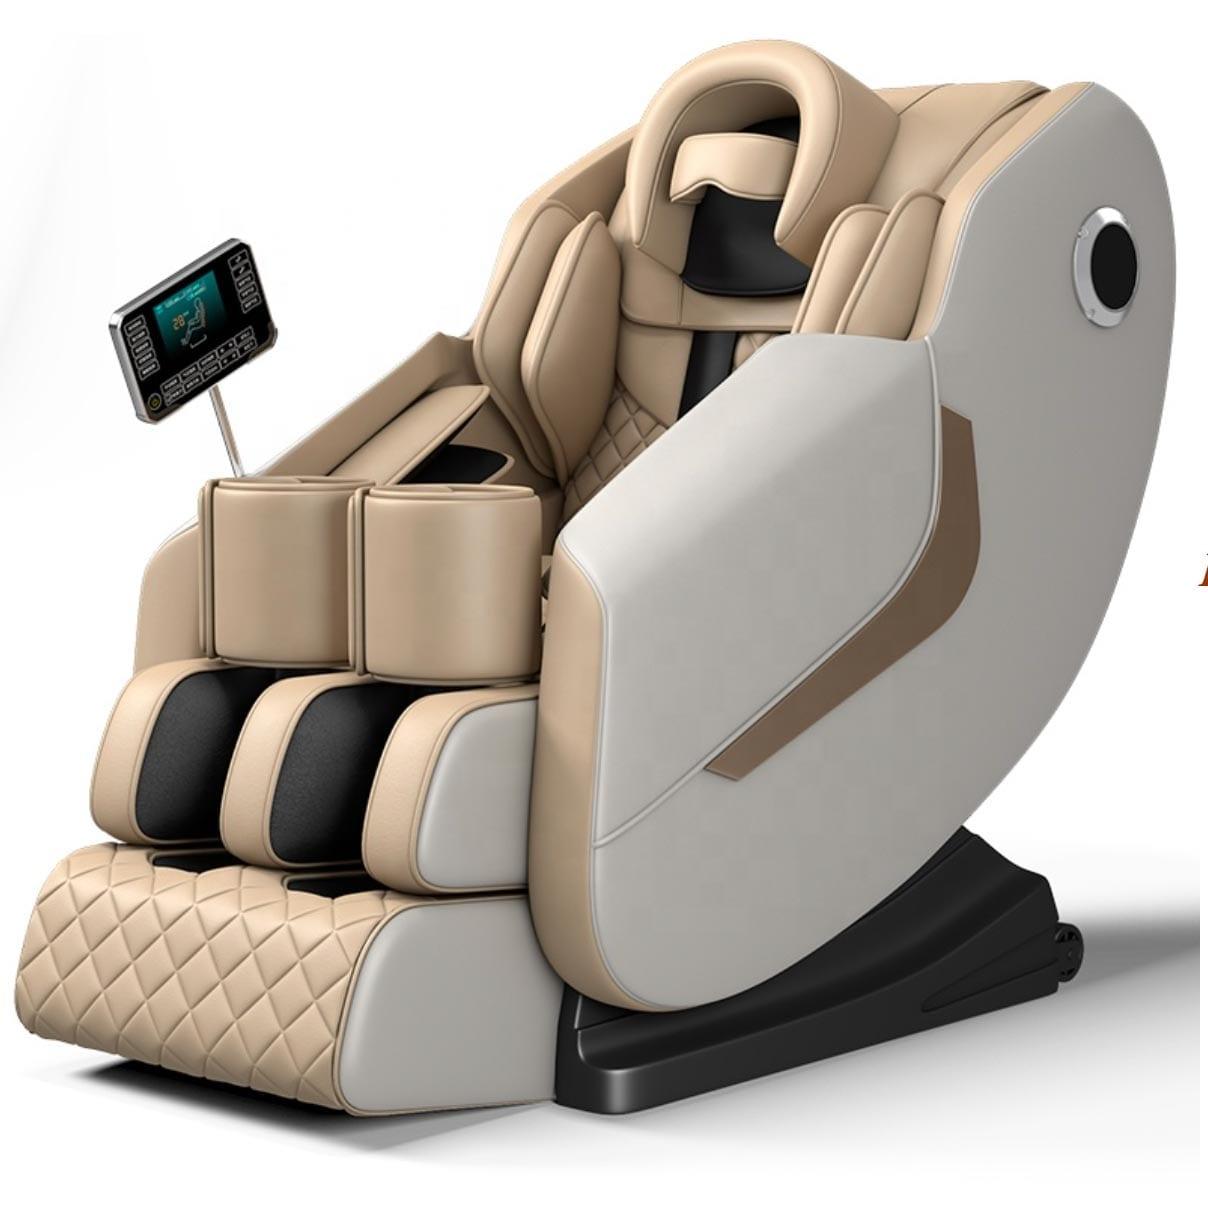 Full-option-massage-chair-beige